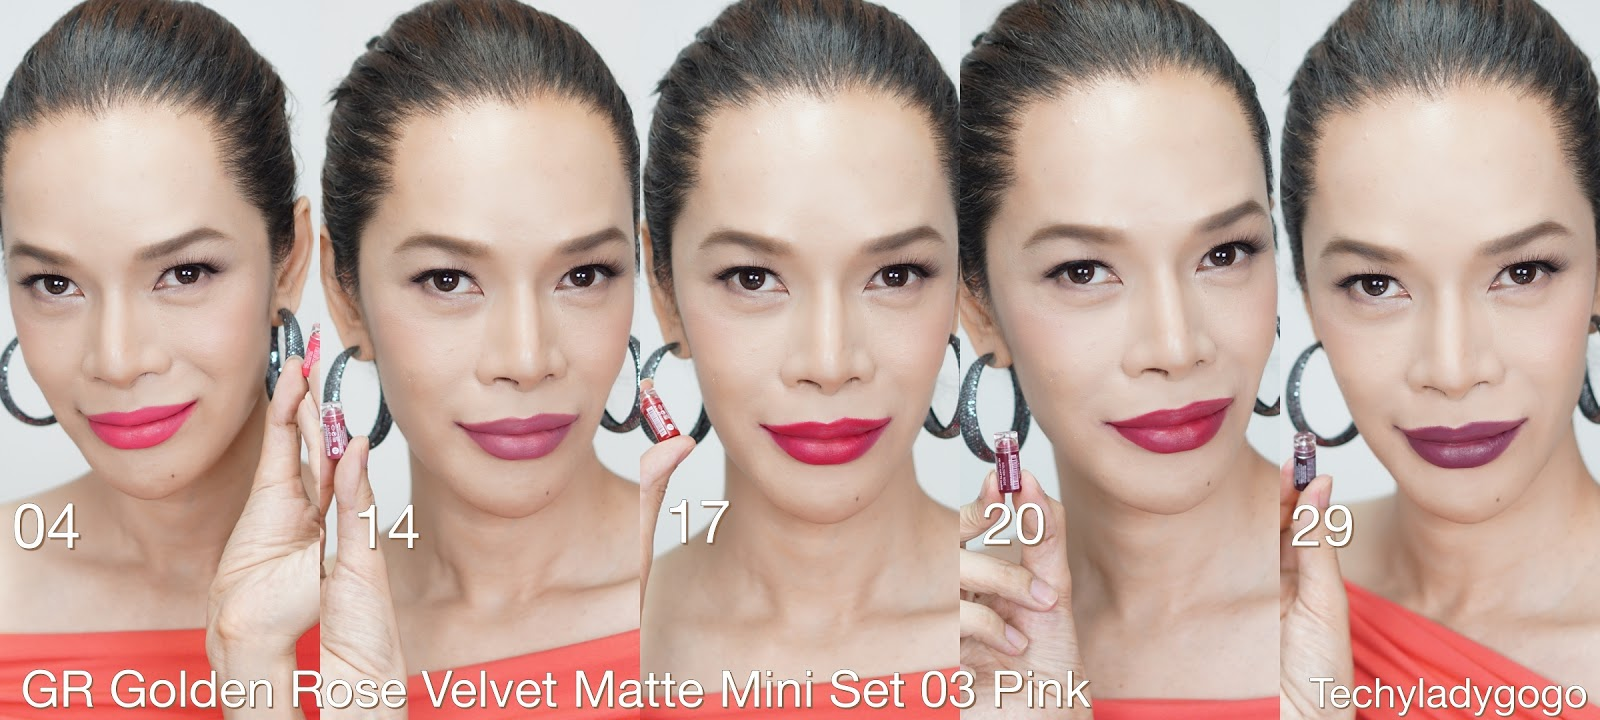 review swatch รีวิว GR Golden Rose Velvet Matte Mini Lipstick ลิปจิ๋วแต่แจ๋ว ยอดฮิตที่ใคร ๆ ต้องมี